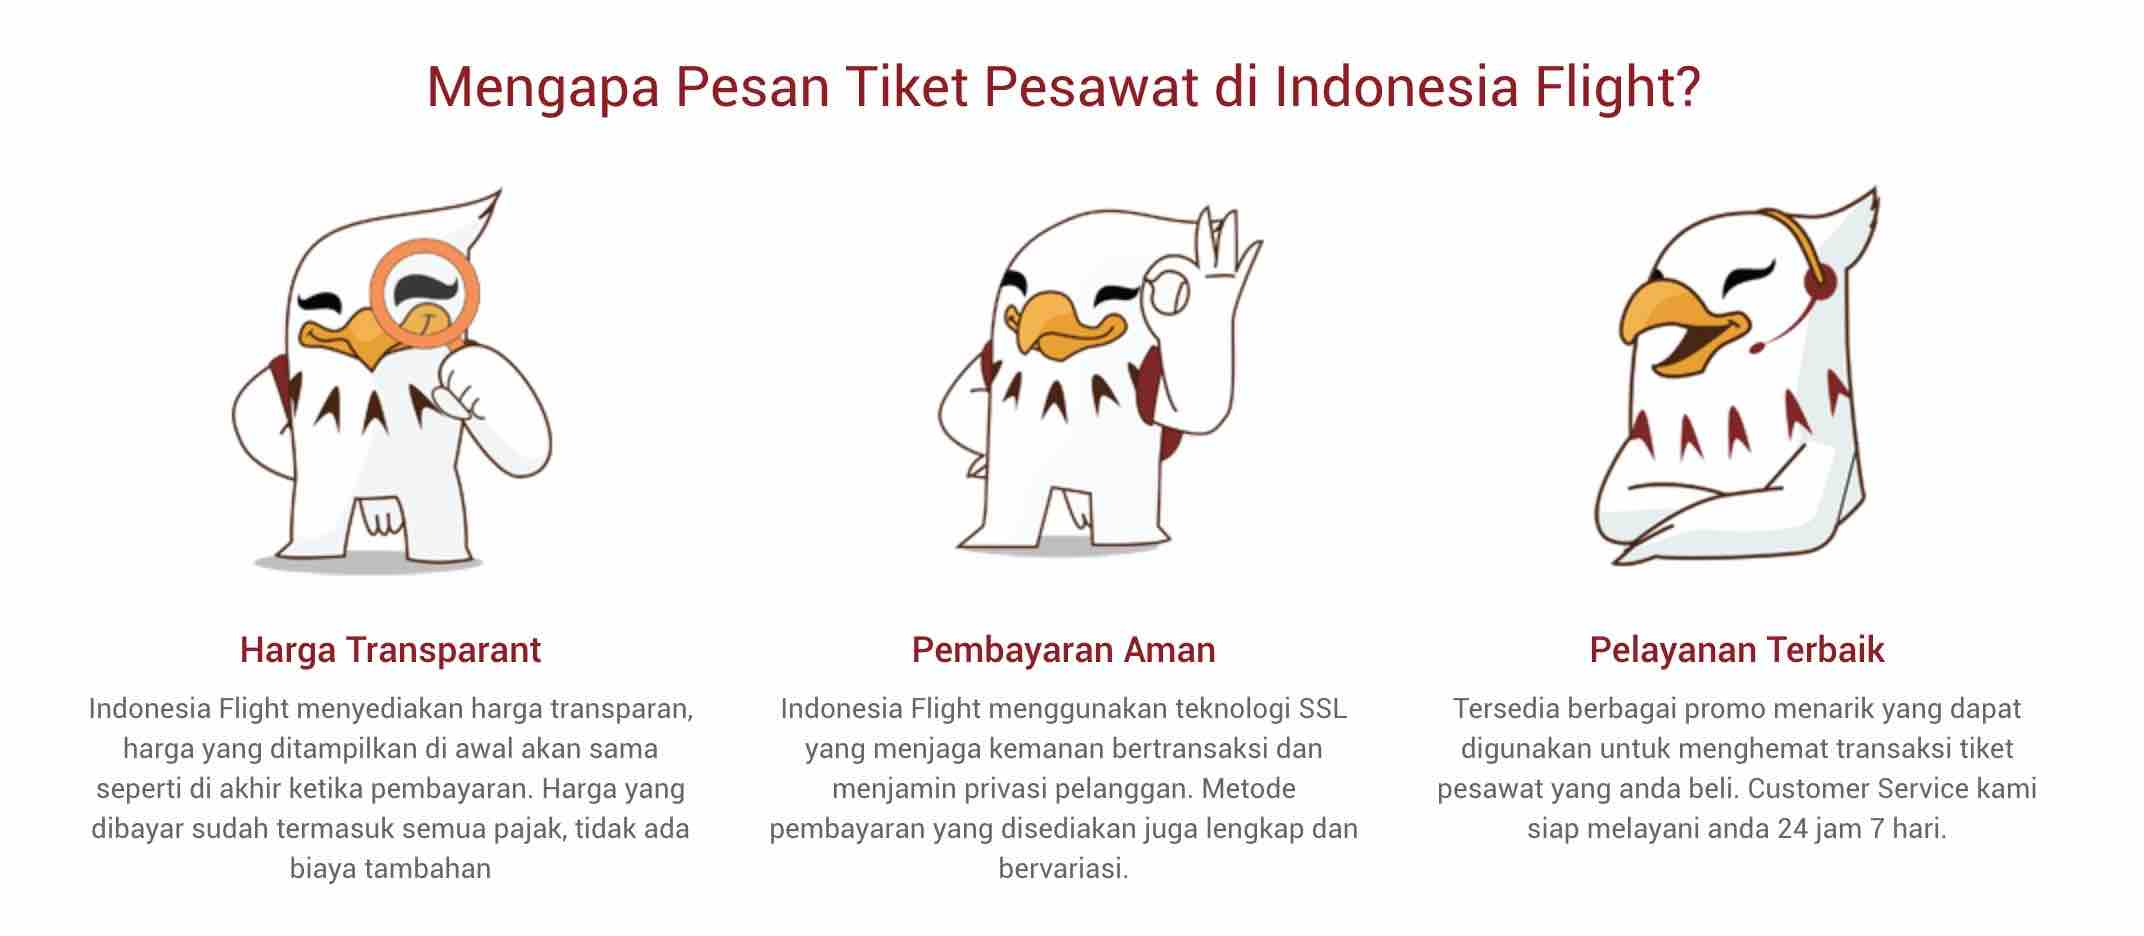 Indonesia Flight Promo Tiket